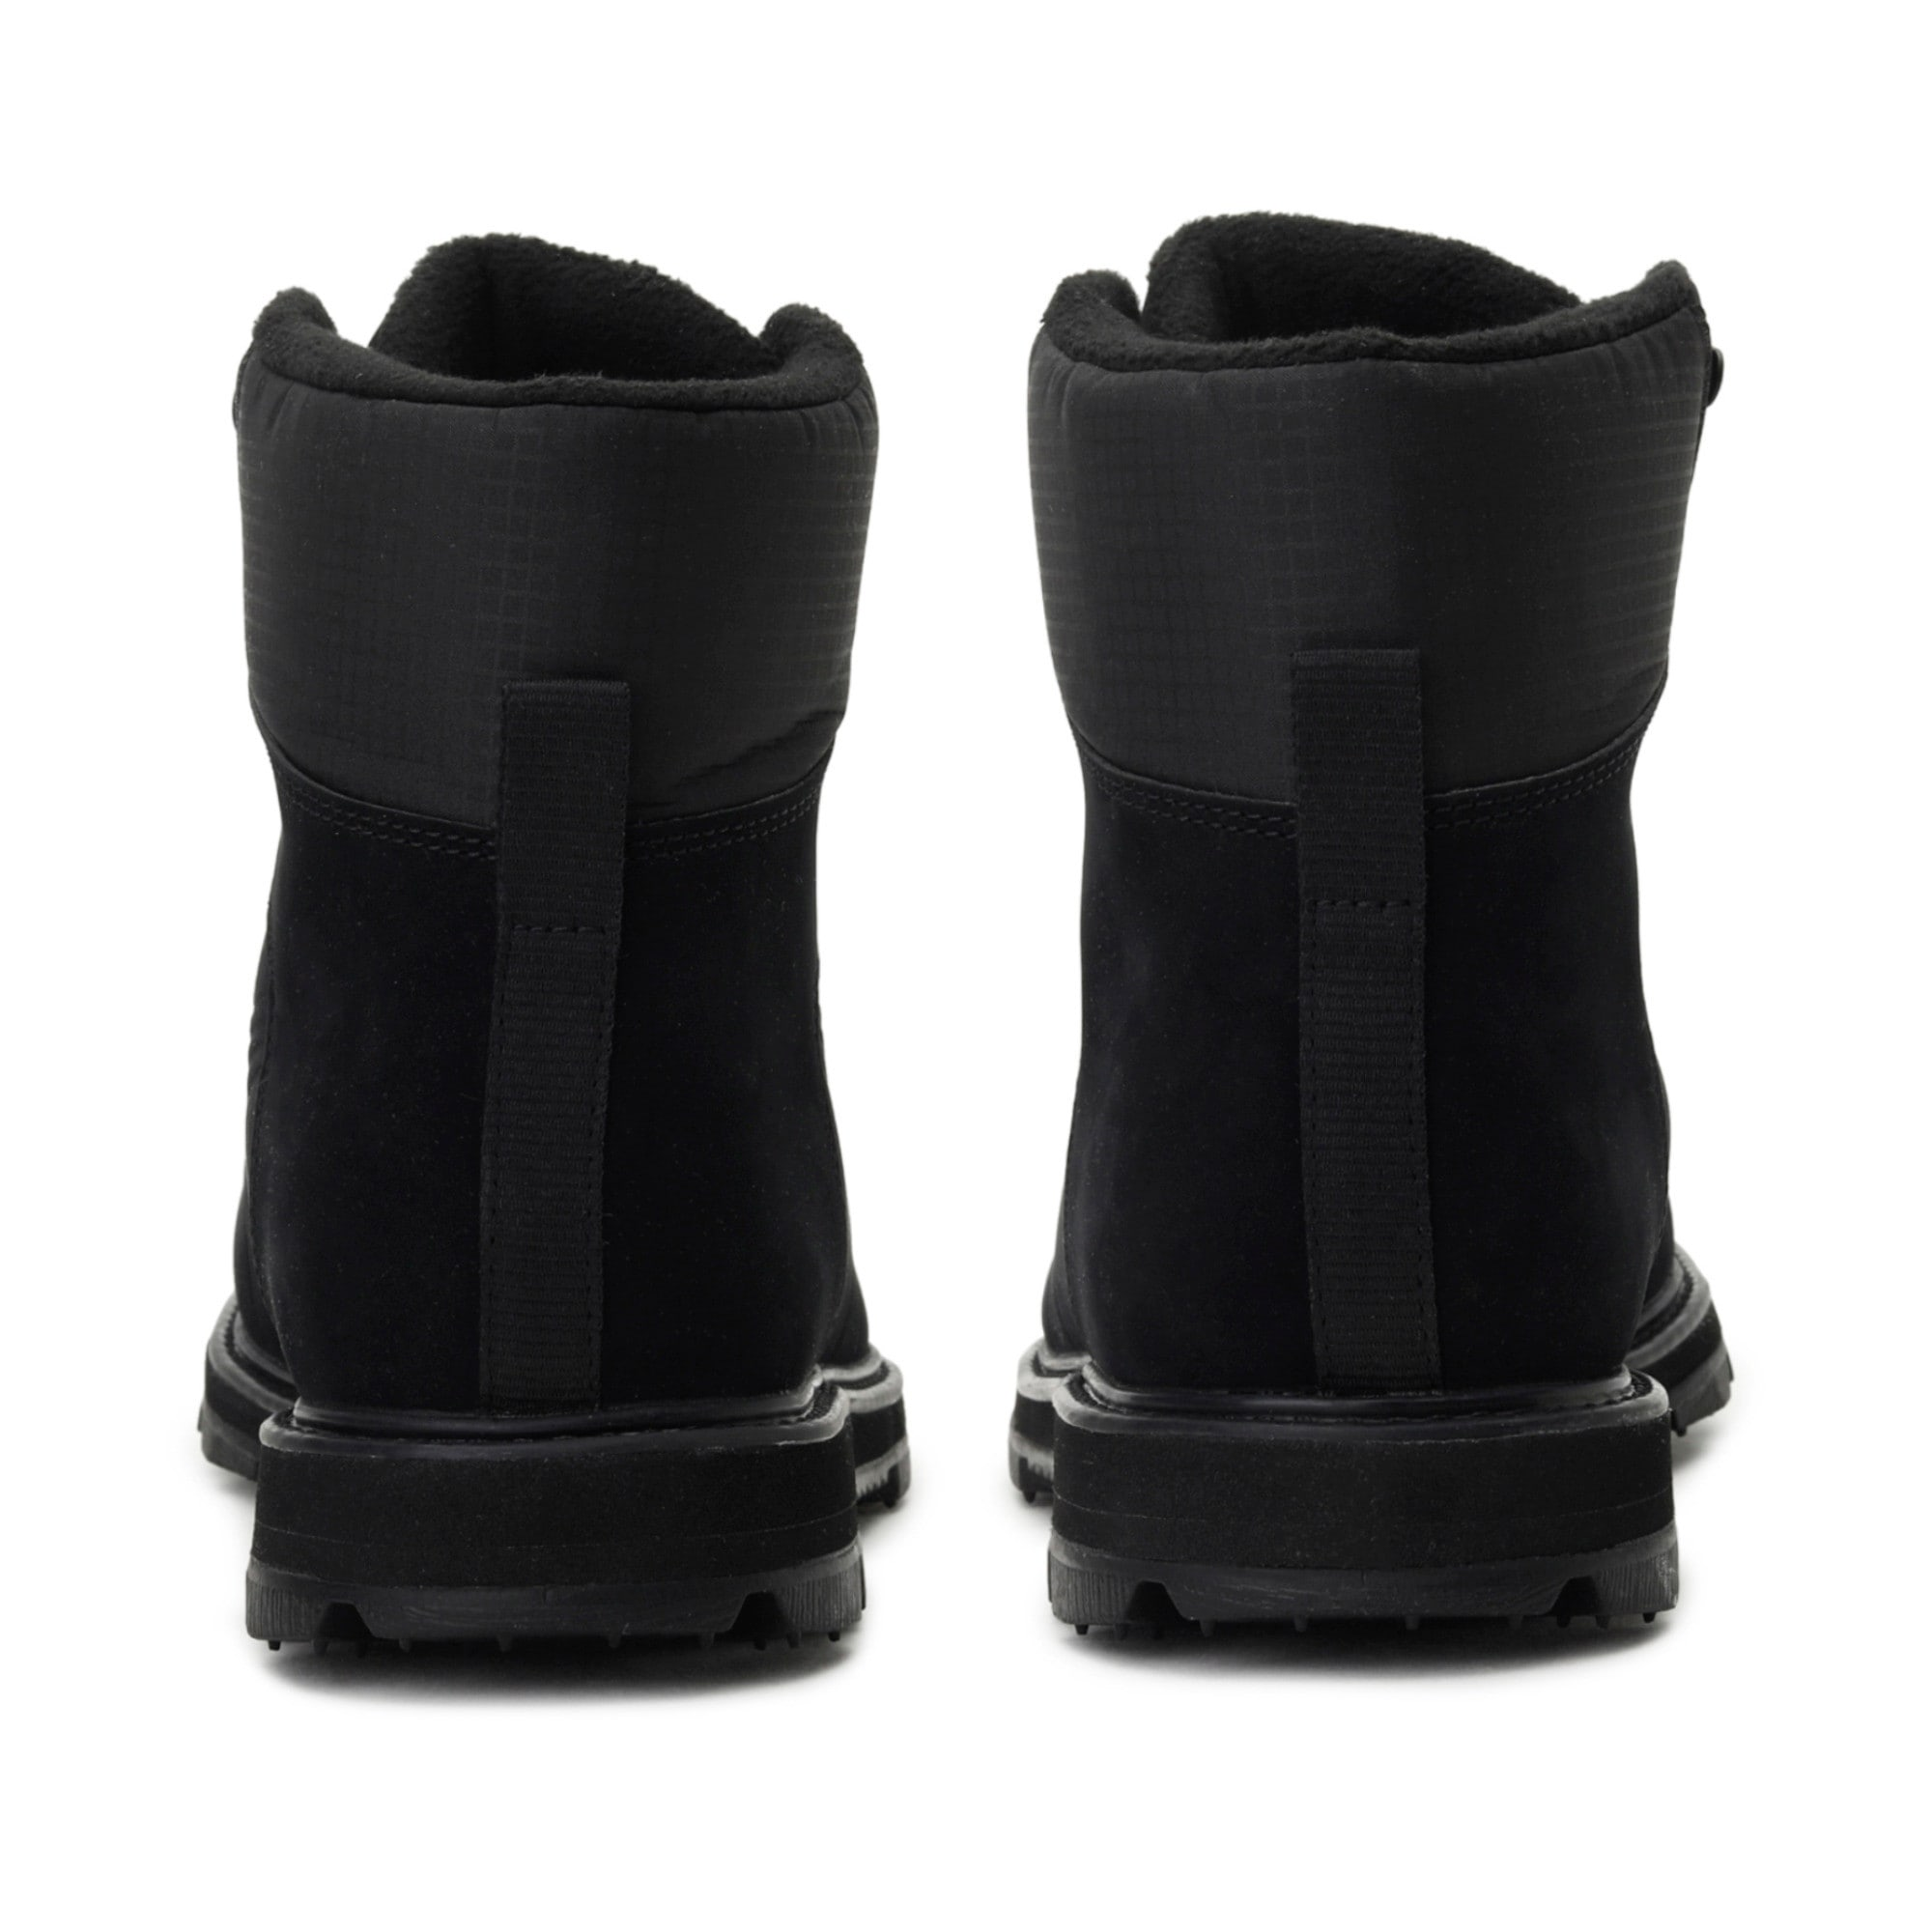 Thumbnail 3 of Desierto Fun Winter Boots, Puma Black- Black- Black, medium-IND